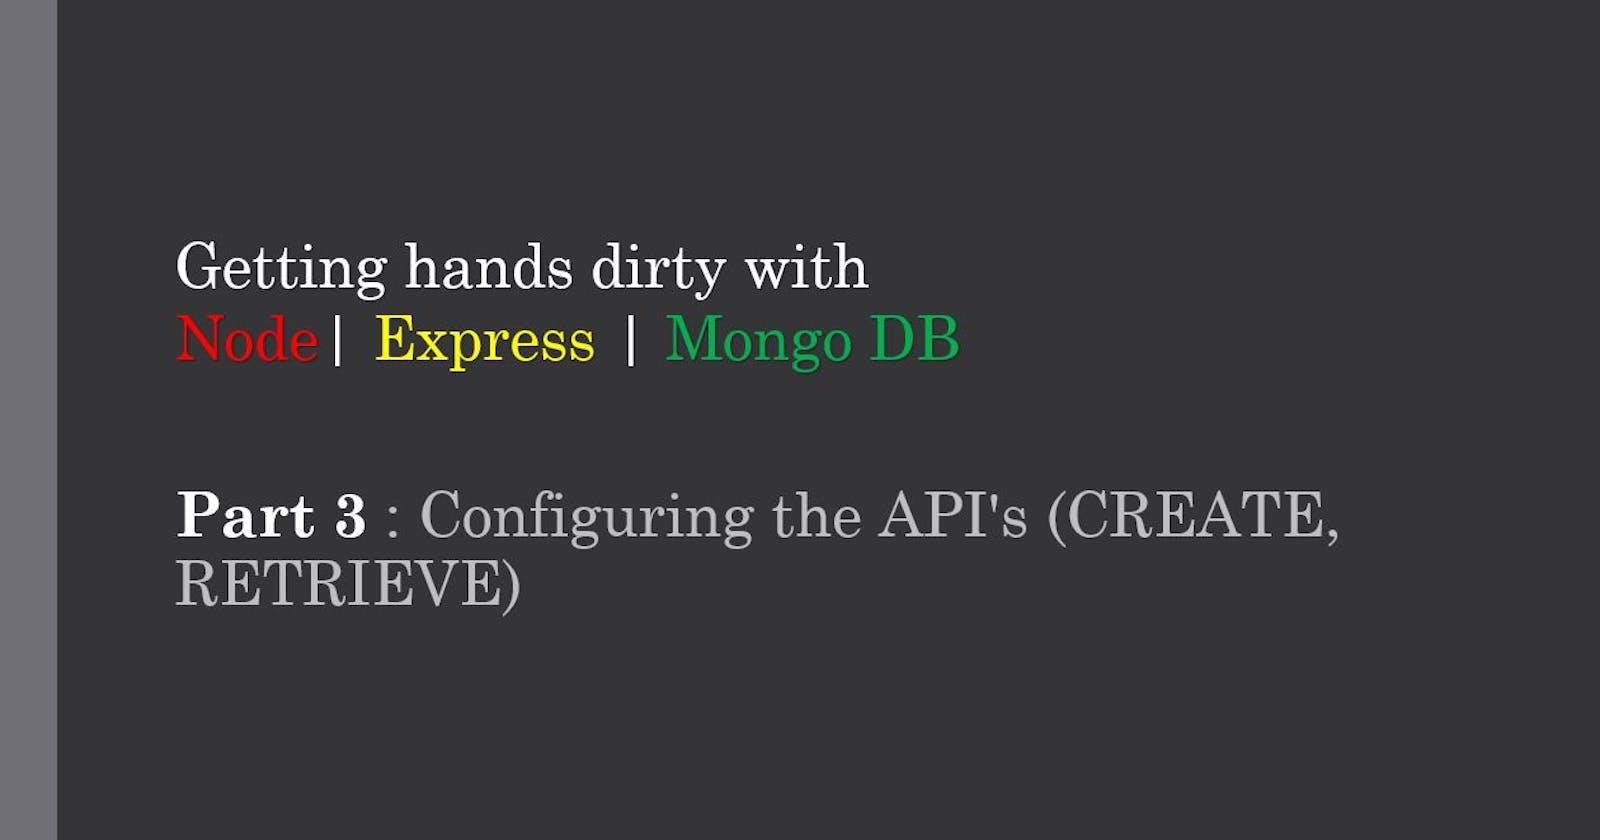 CRUD Application Using Node JS - PART 3 : Configuring the API's (CREATE, RETRIEVE)